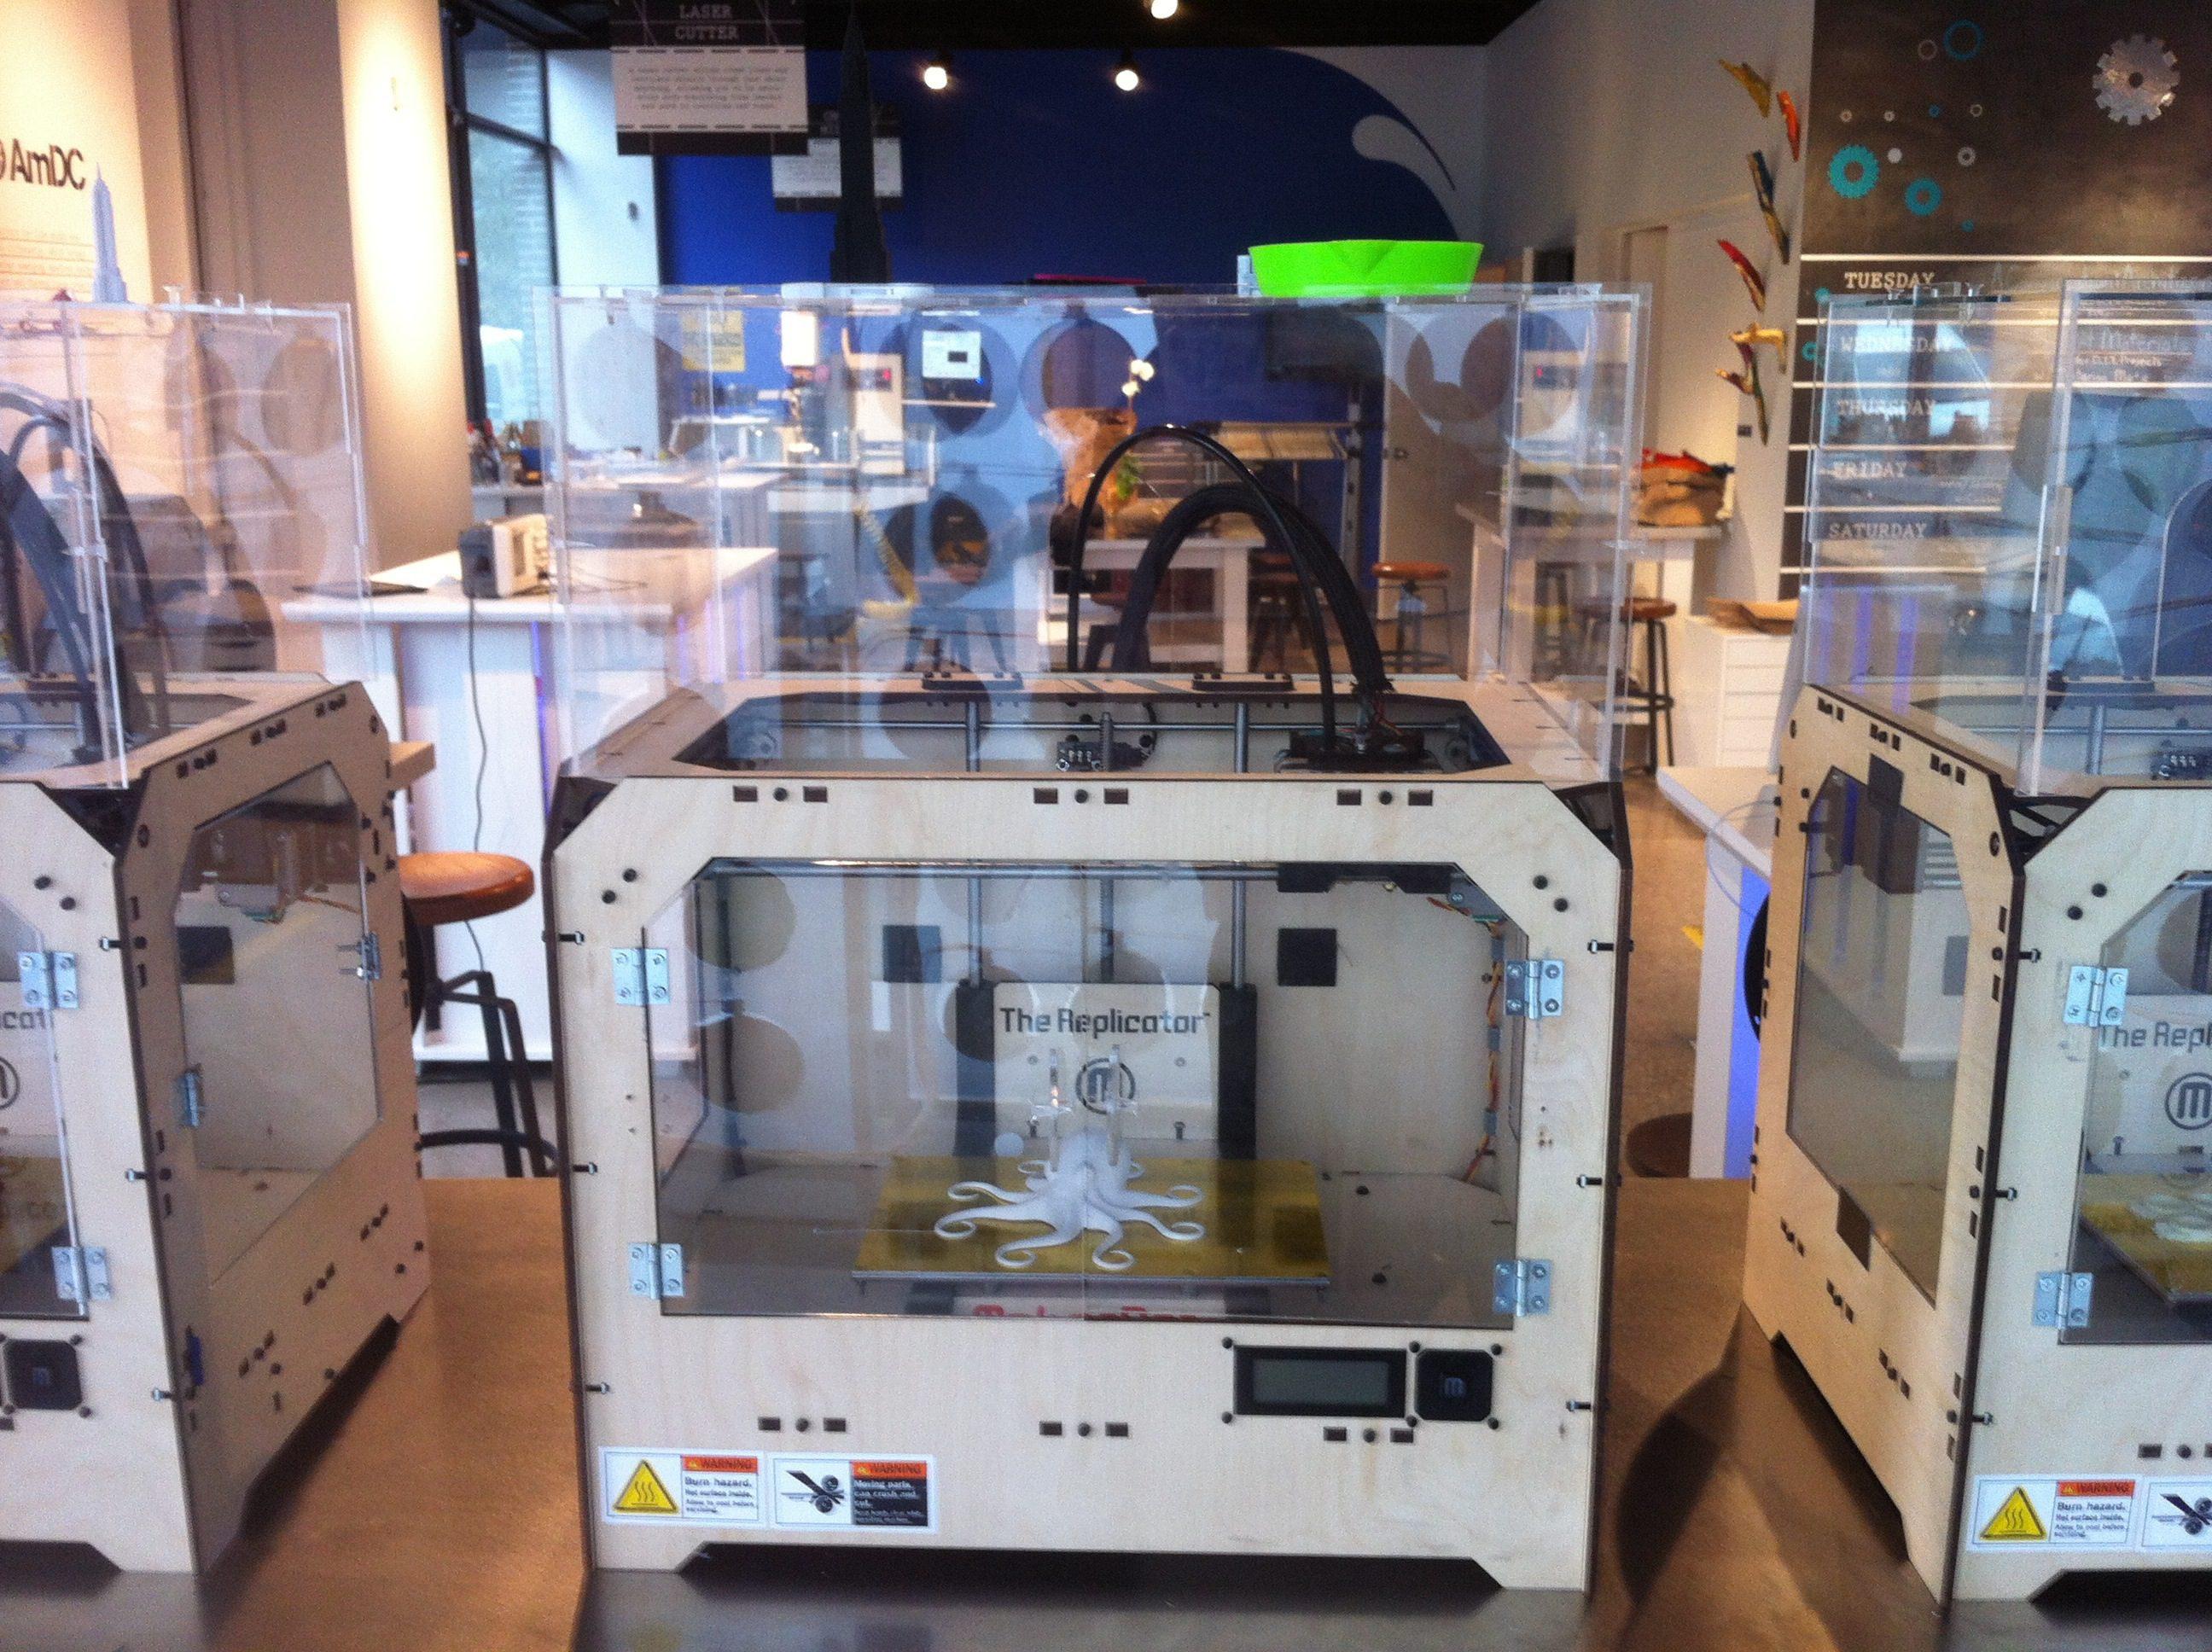 Story, GE 3D printer, The Myndset Digital marketing and brand strategy